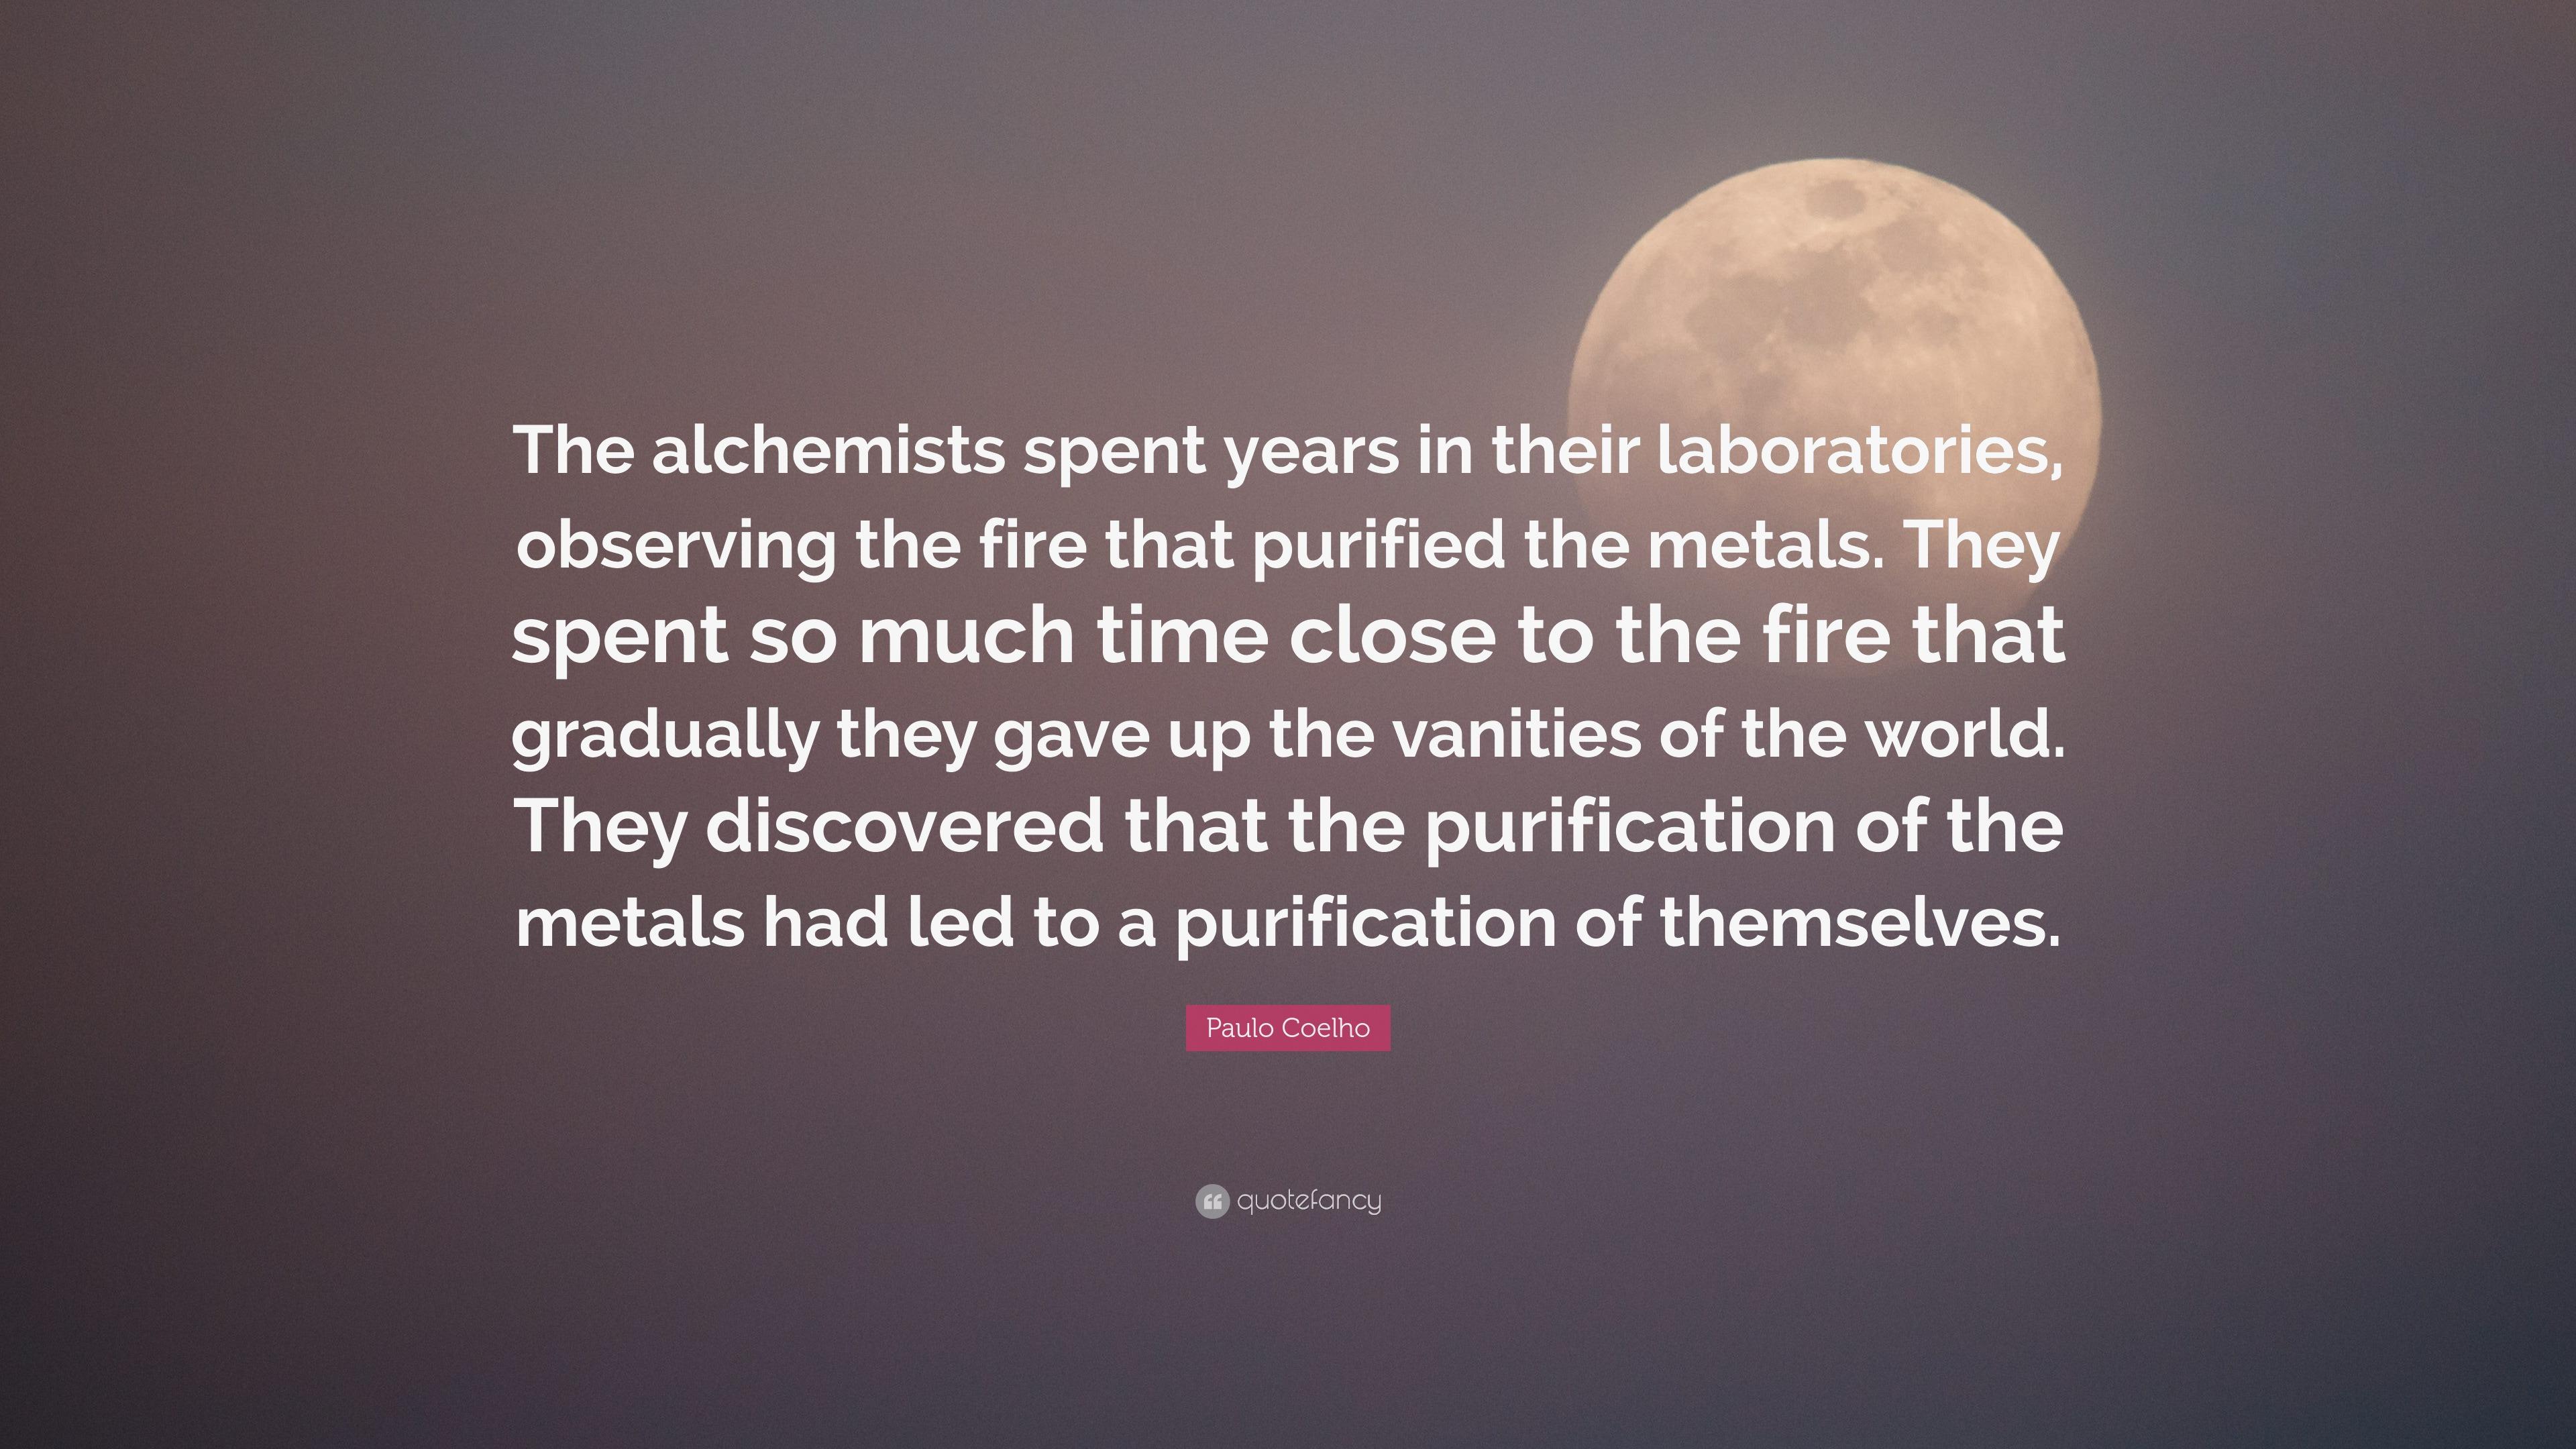 paulo coelho quotes author of the alchemist goodreads - HD3840×2160